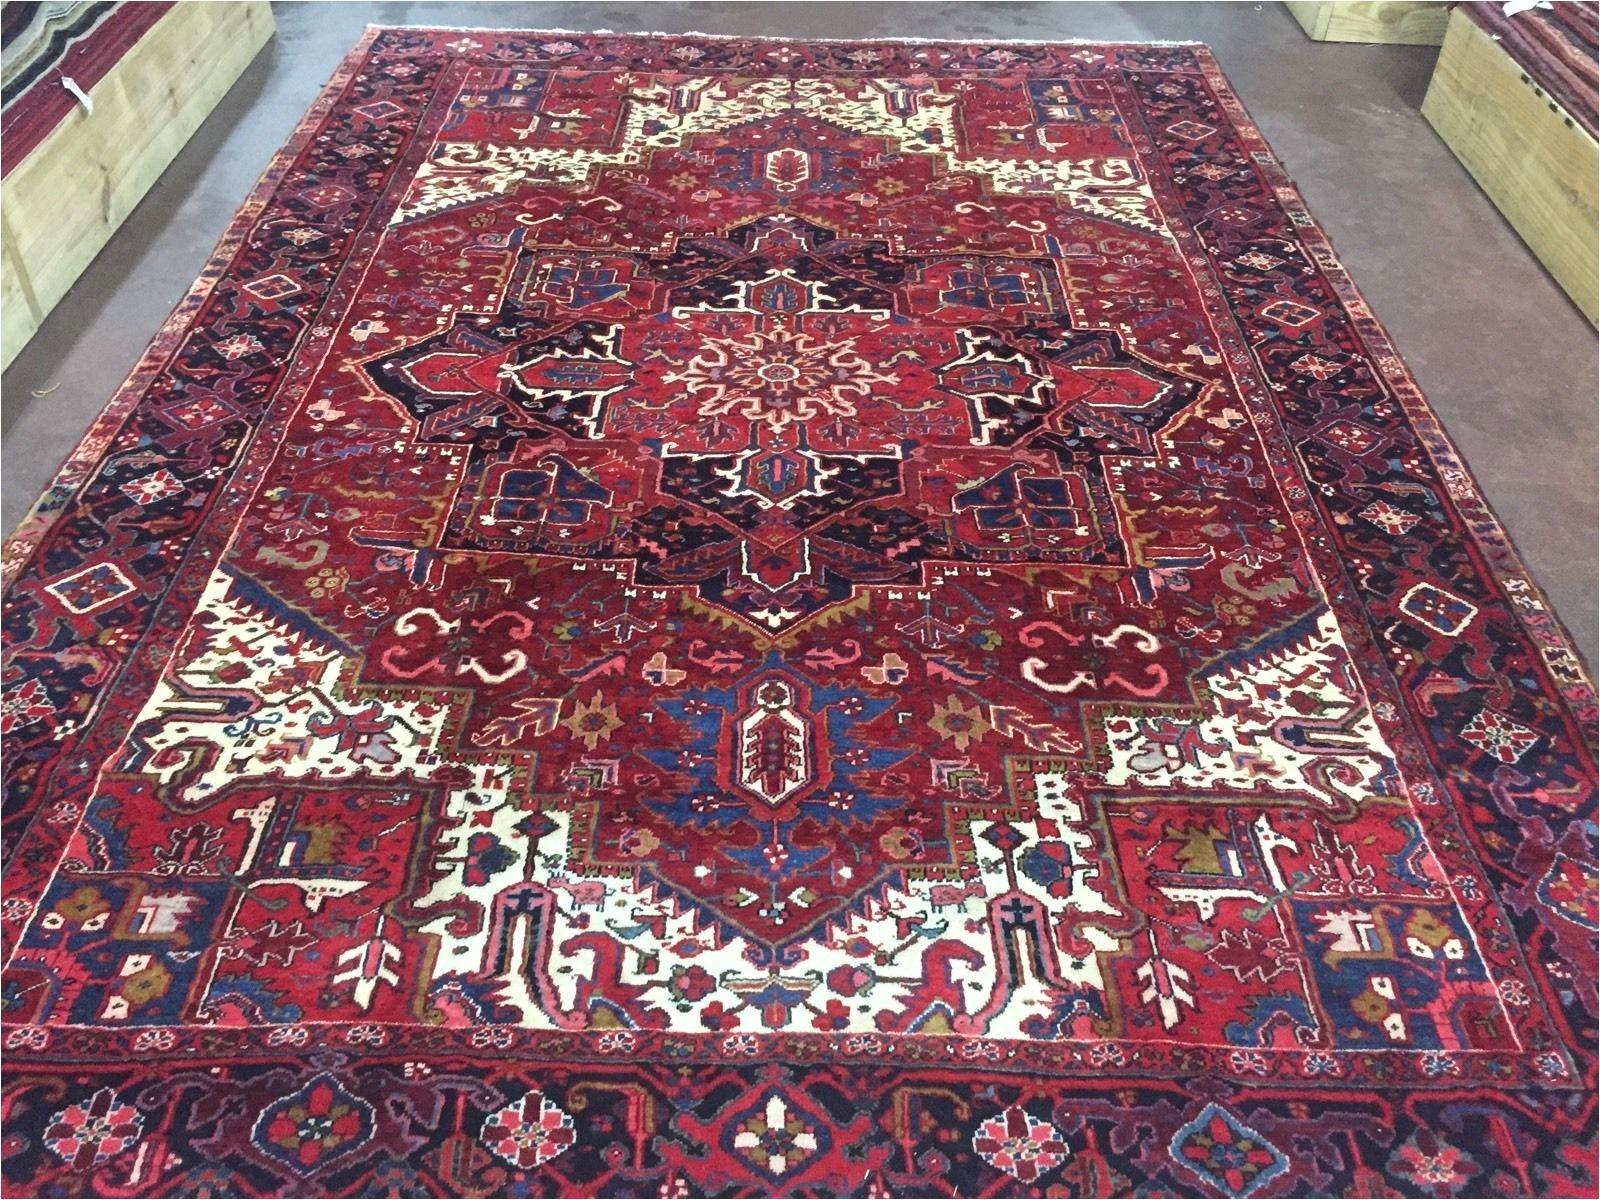 sale great hand knotted persian tabriz heriz rug geometric carpet 9x12 8 7 x12 5 ebay